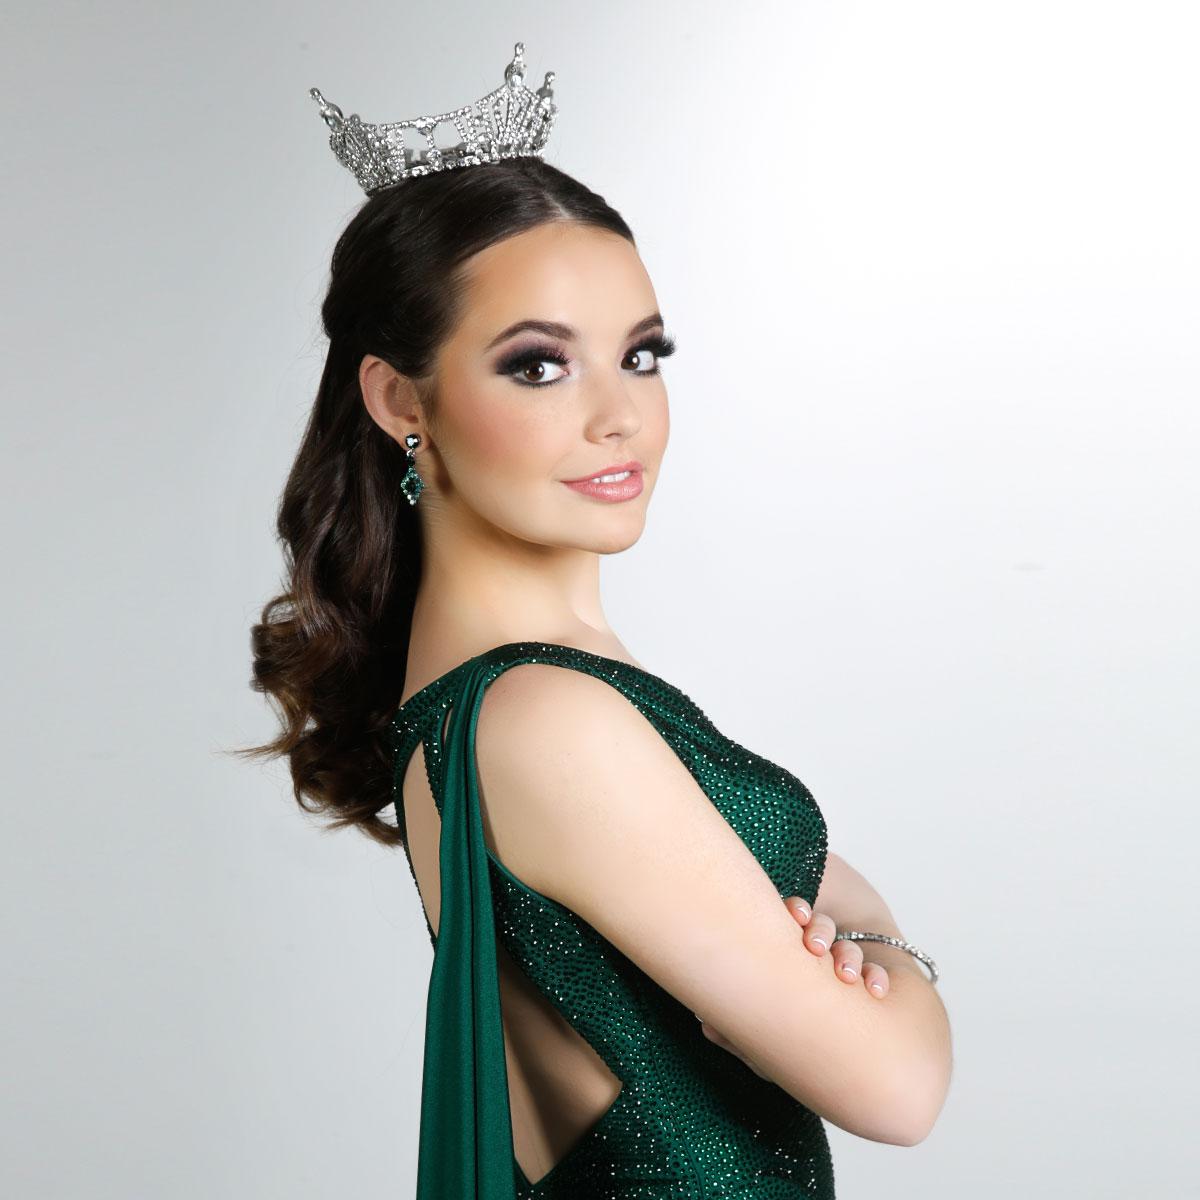 Elaina McCoulskey Miss San Antonio 2022